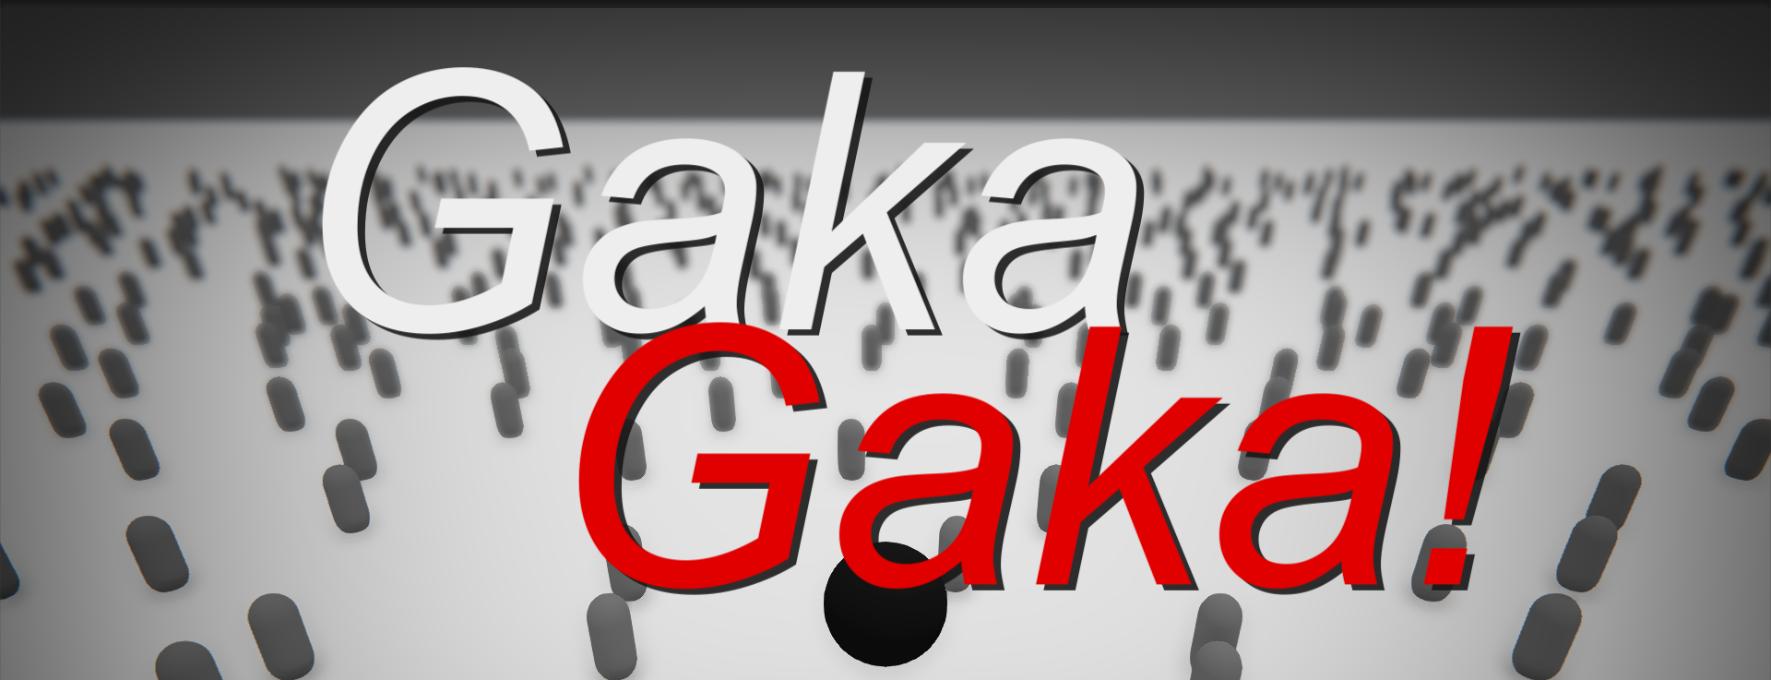 GakaGaka!